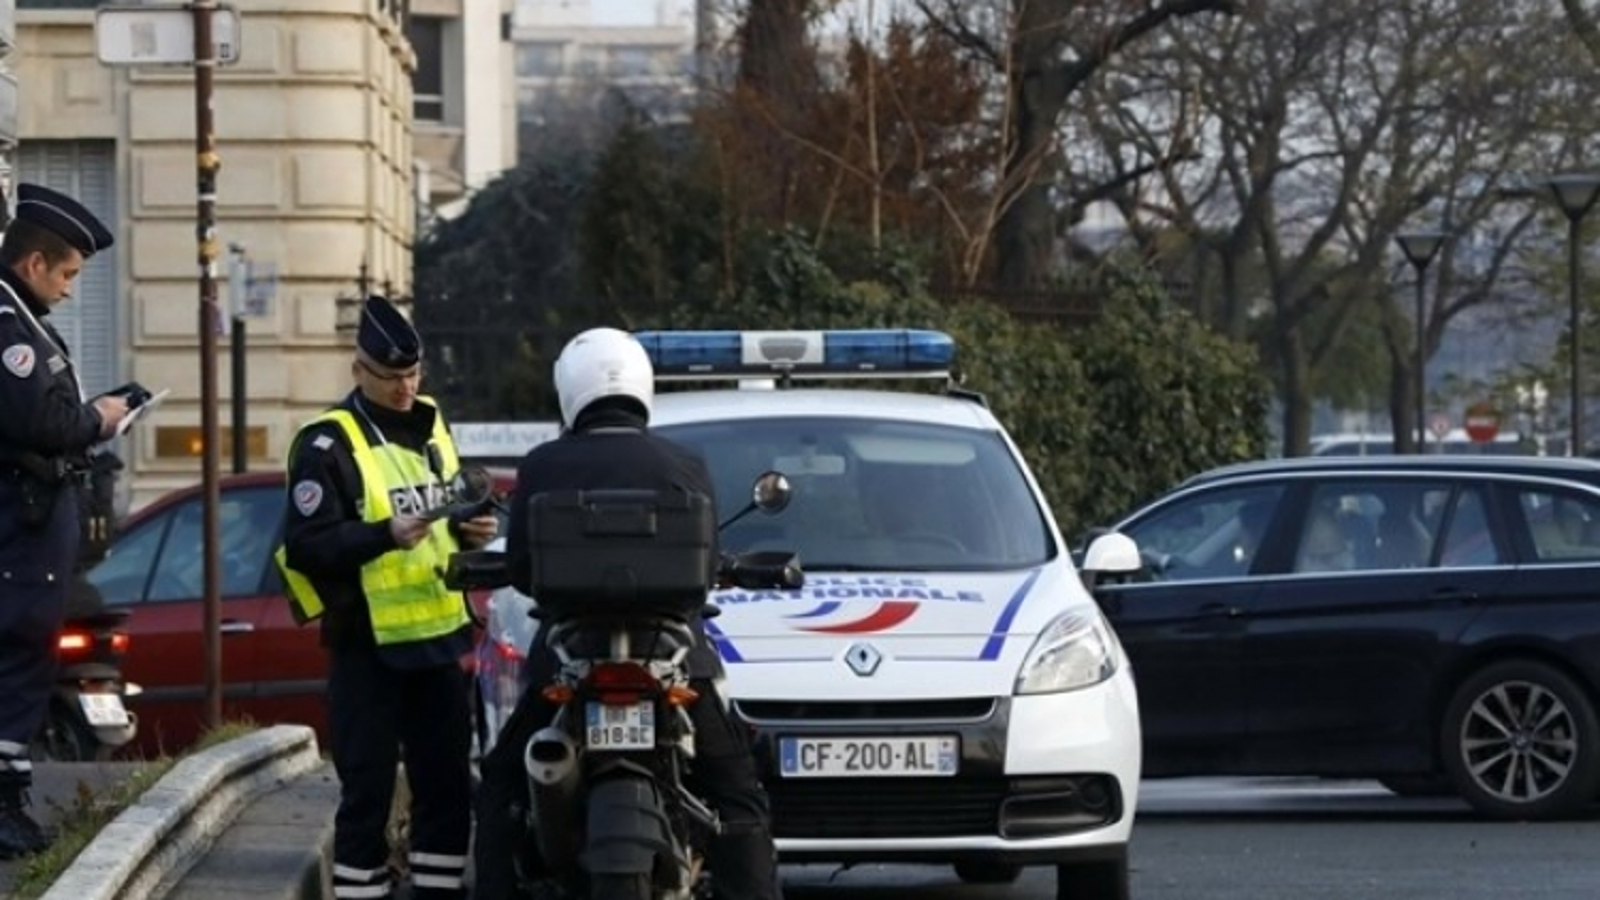 France arrests new suspect in foiled terror plot